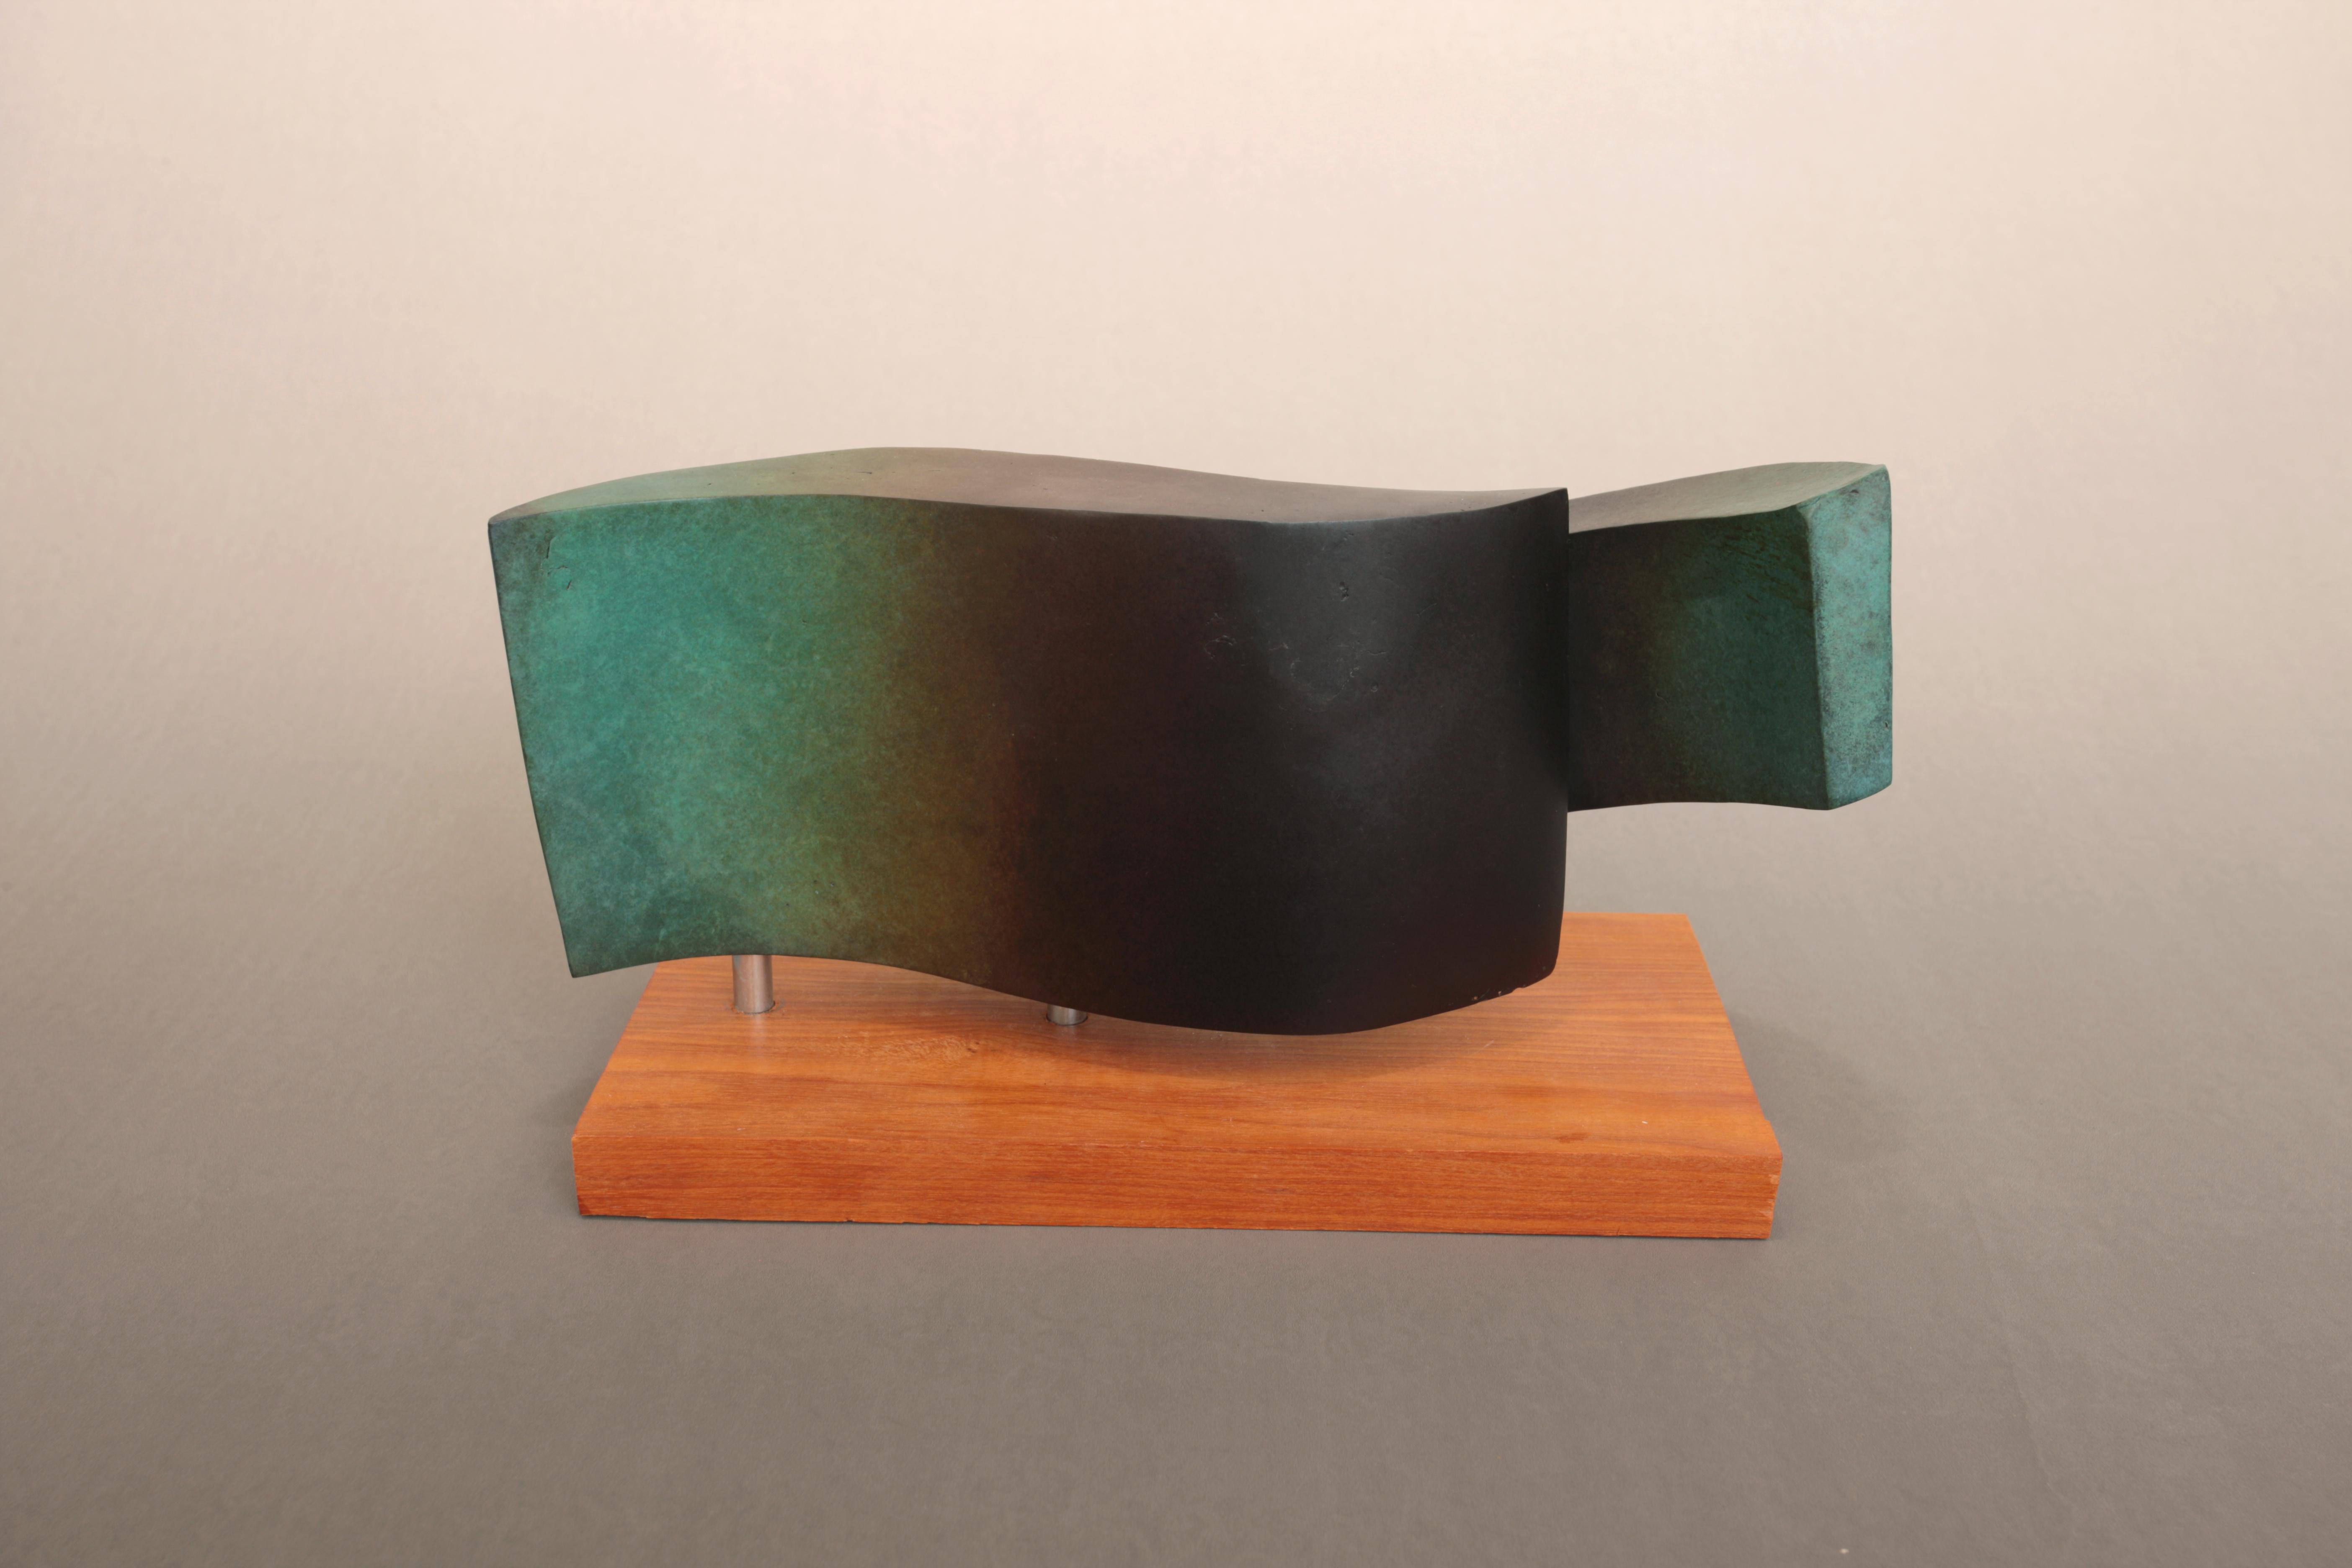 17-02 Wave Form